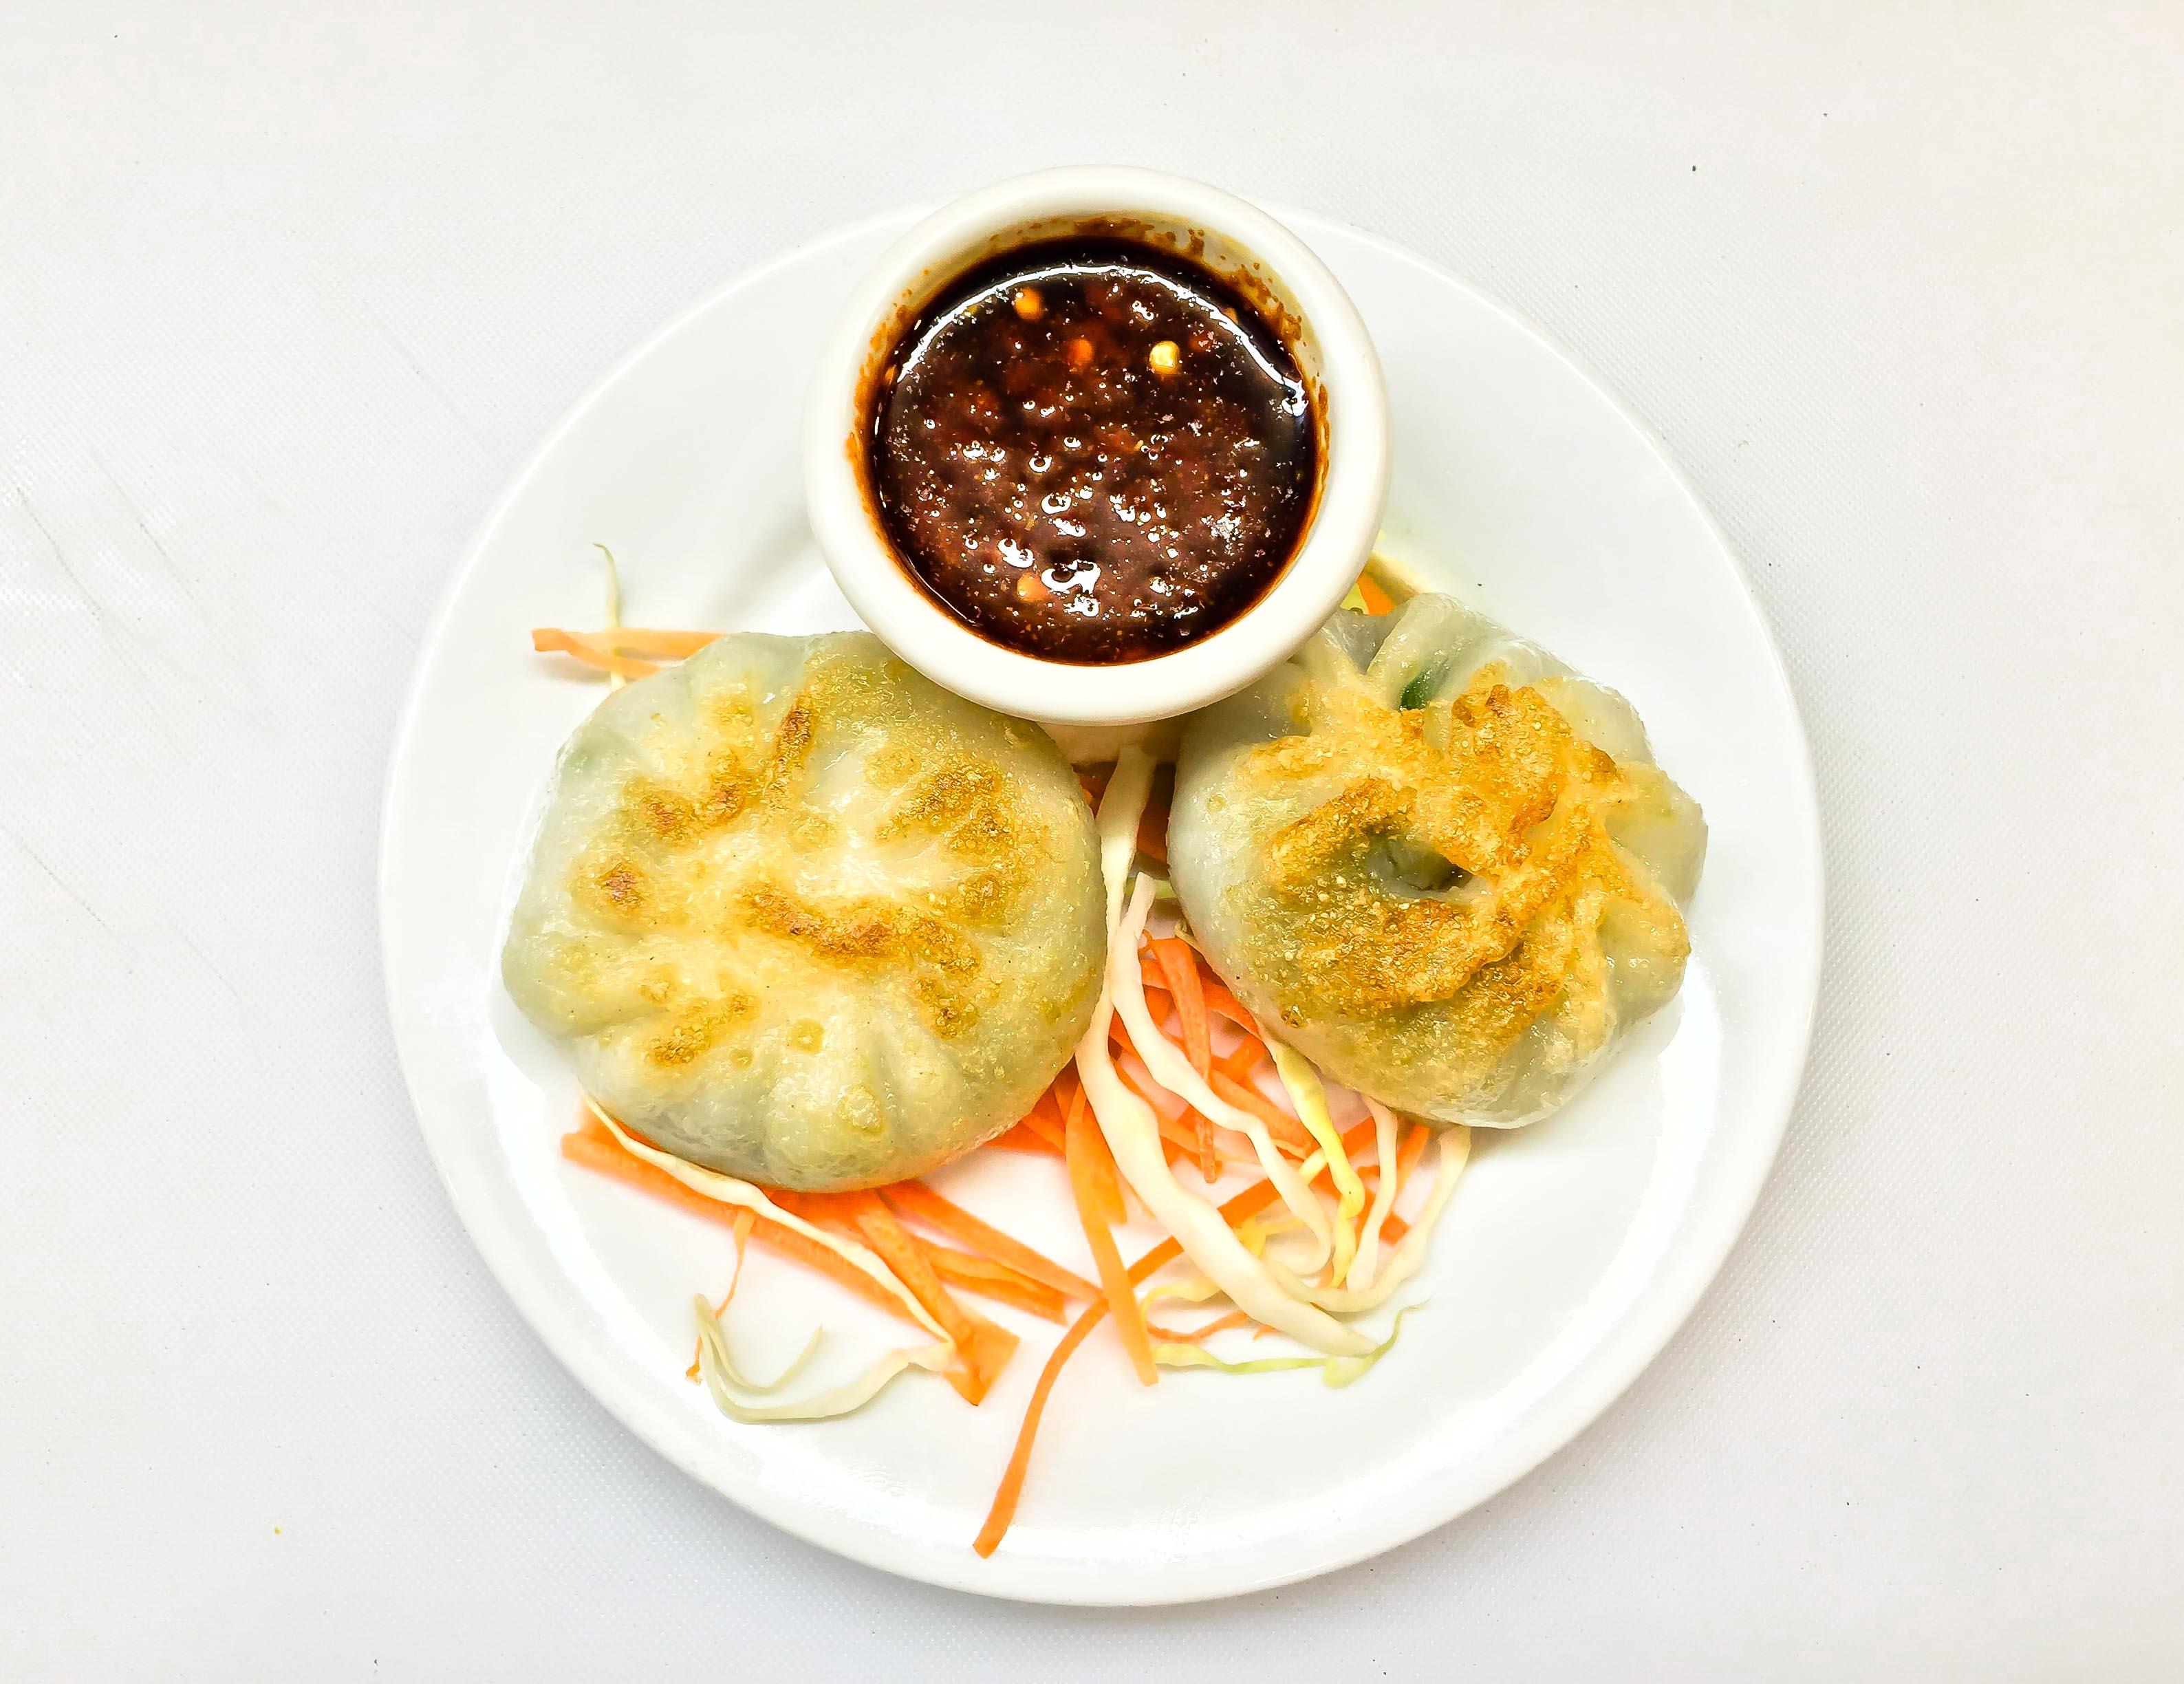 Pan-Fried Vegetable Dumplings (3 pcs) Image